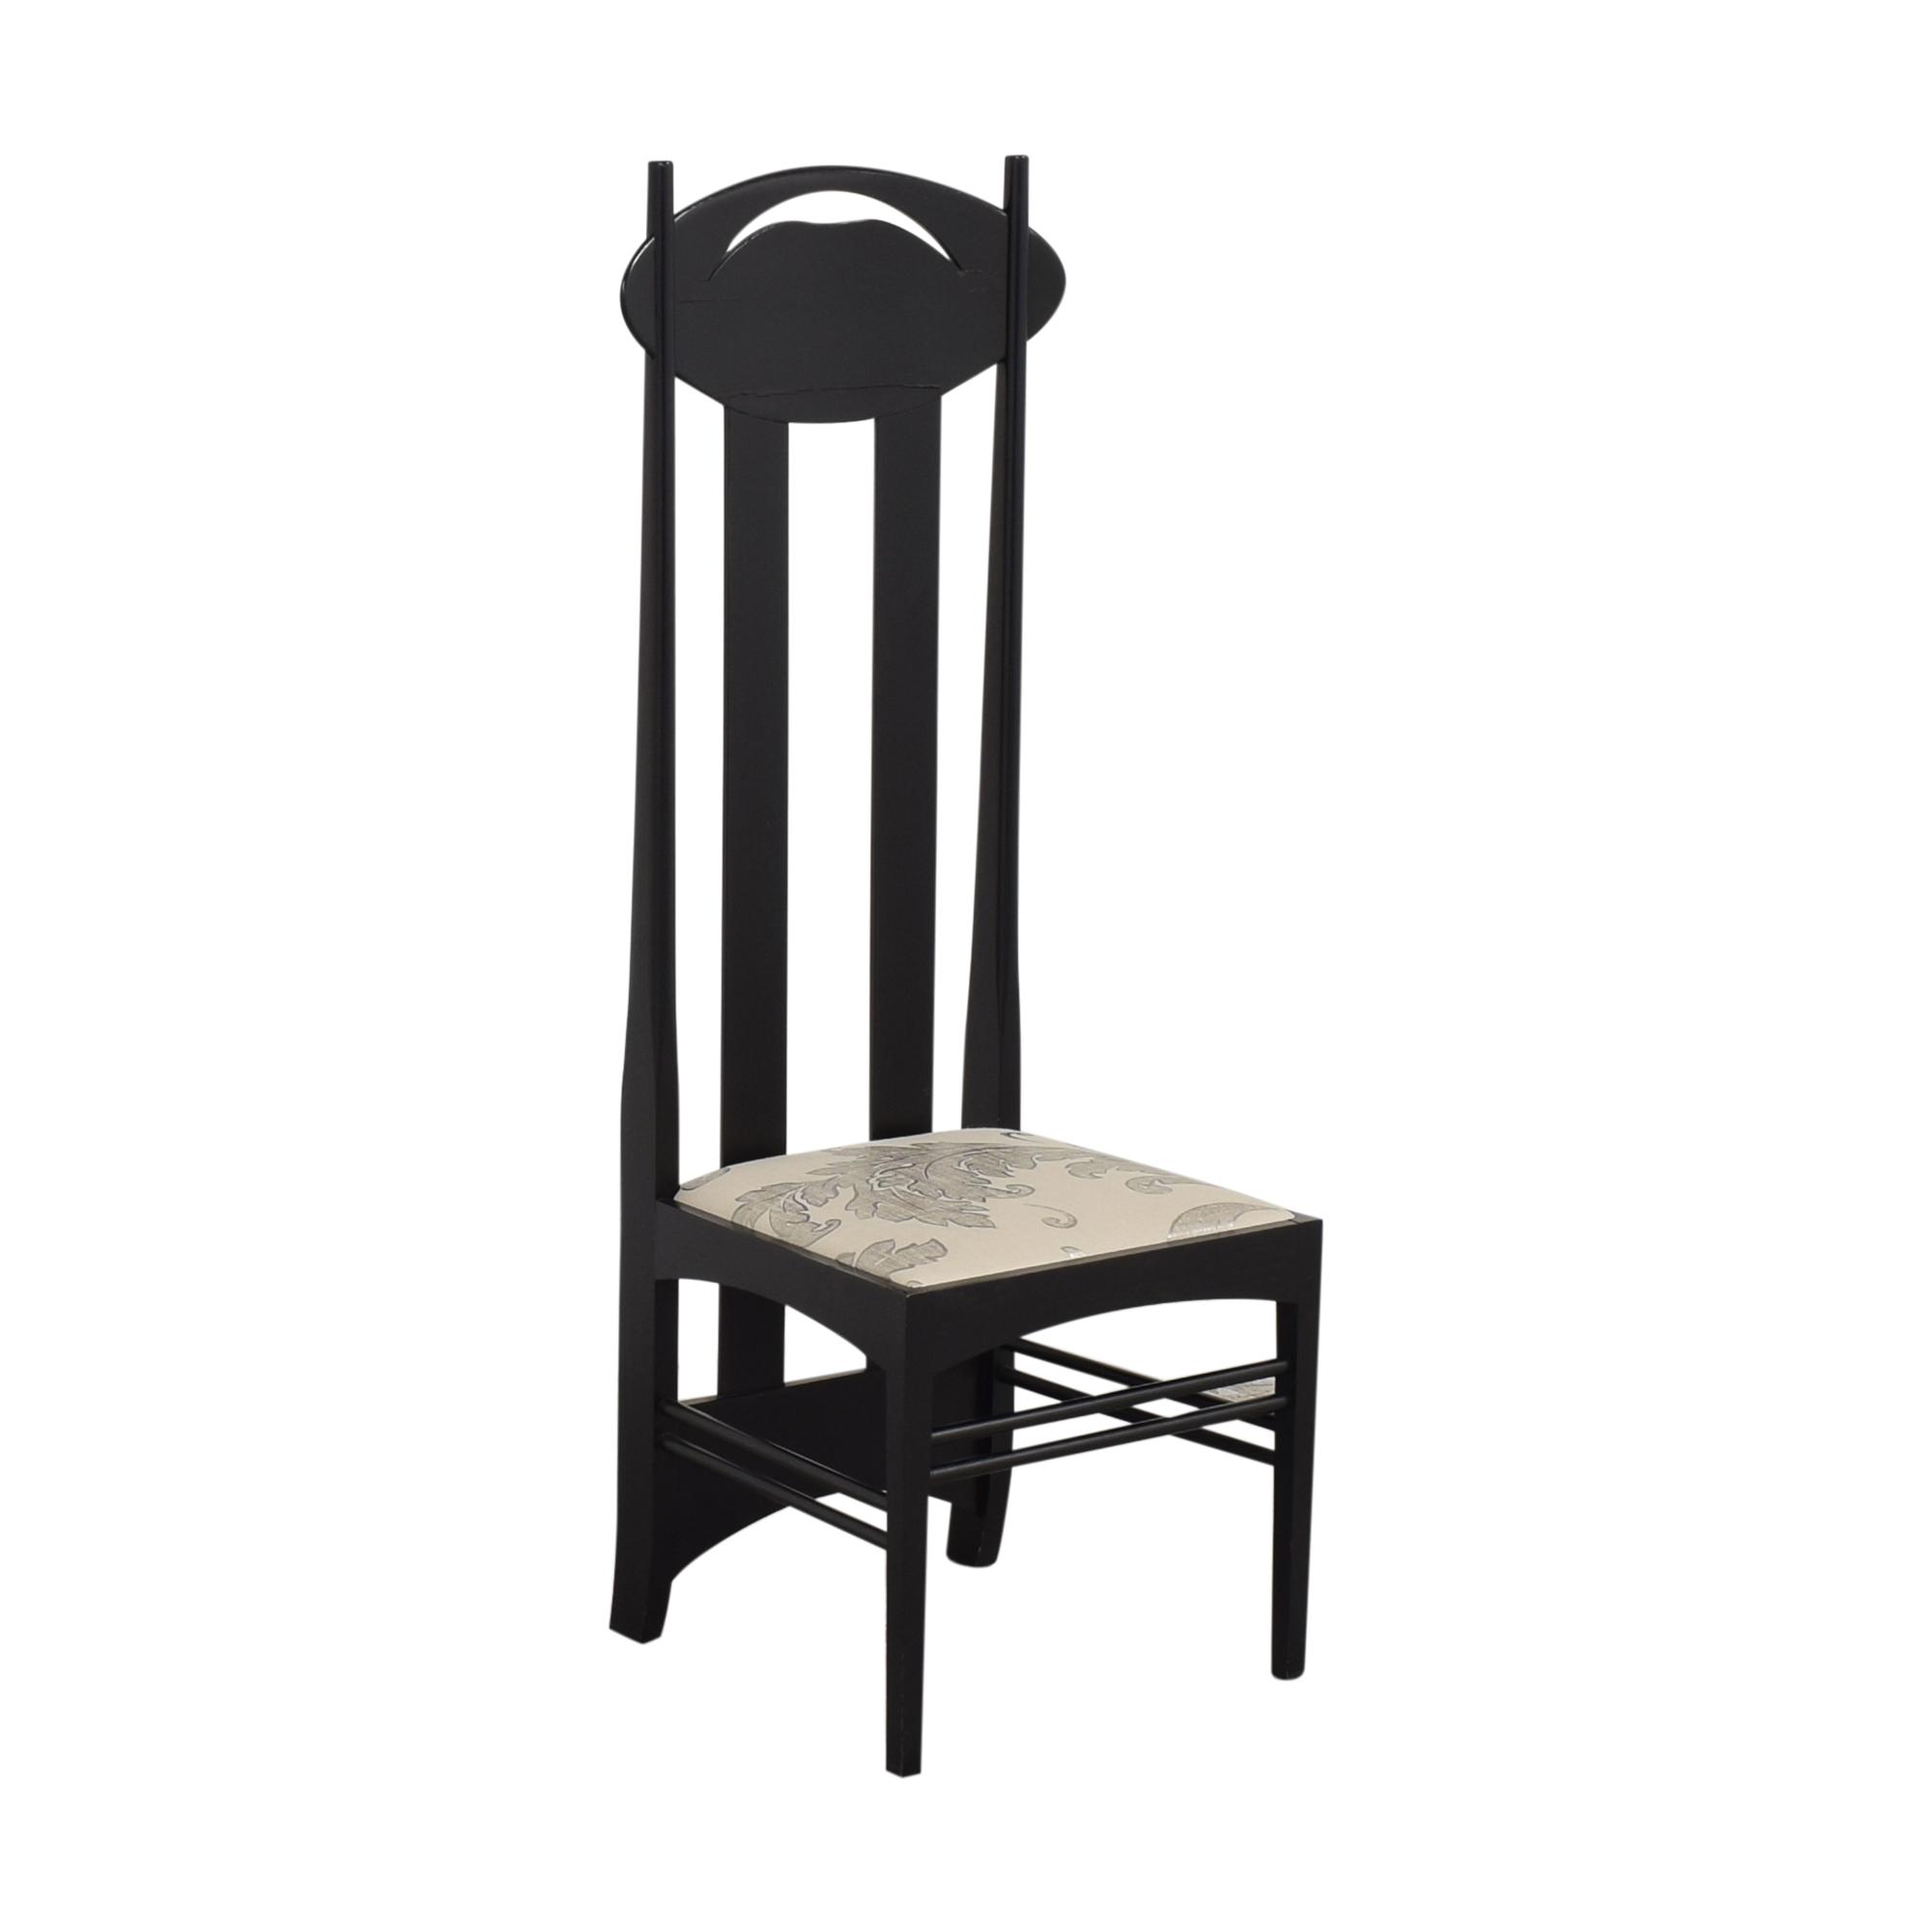 Cassina Cassina Mackintosh Argyle Chair Chairs